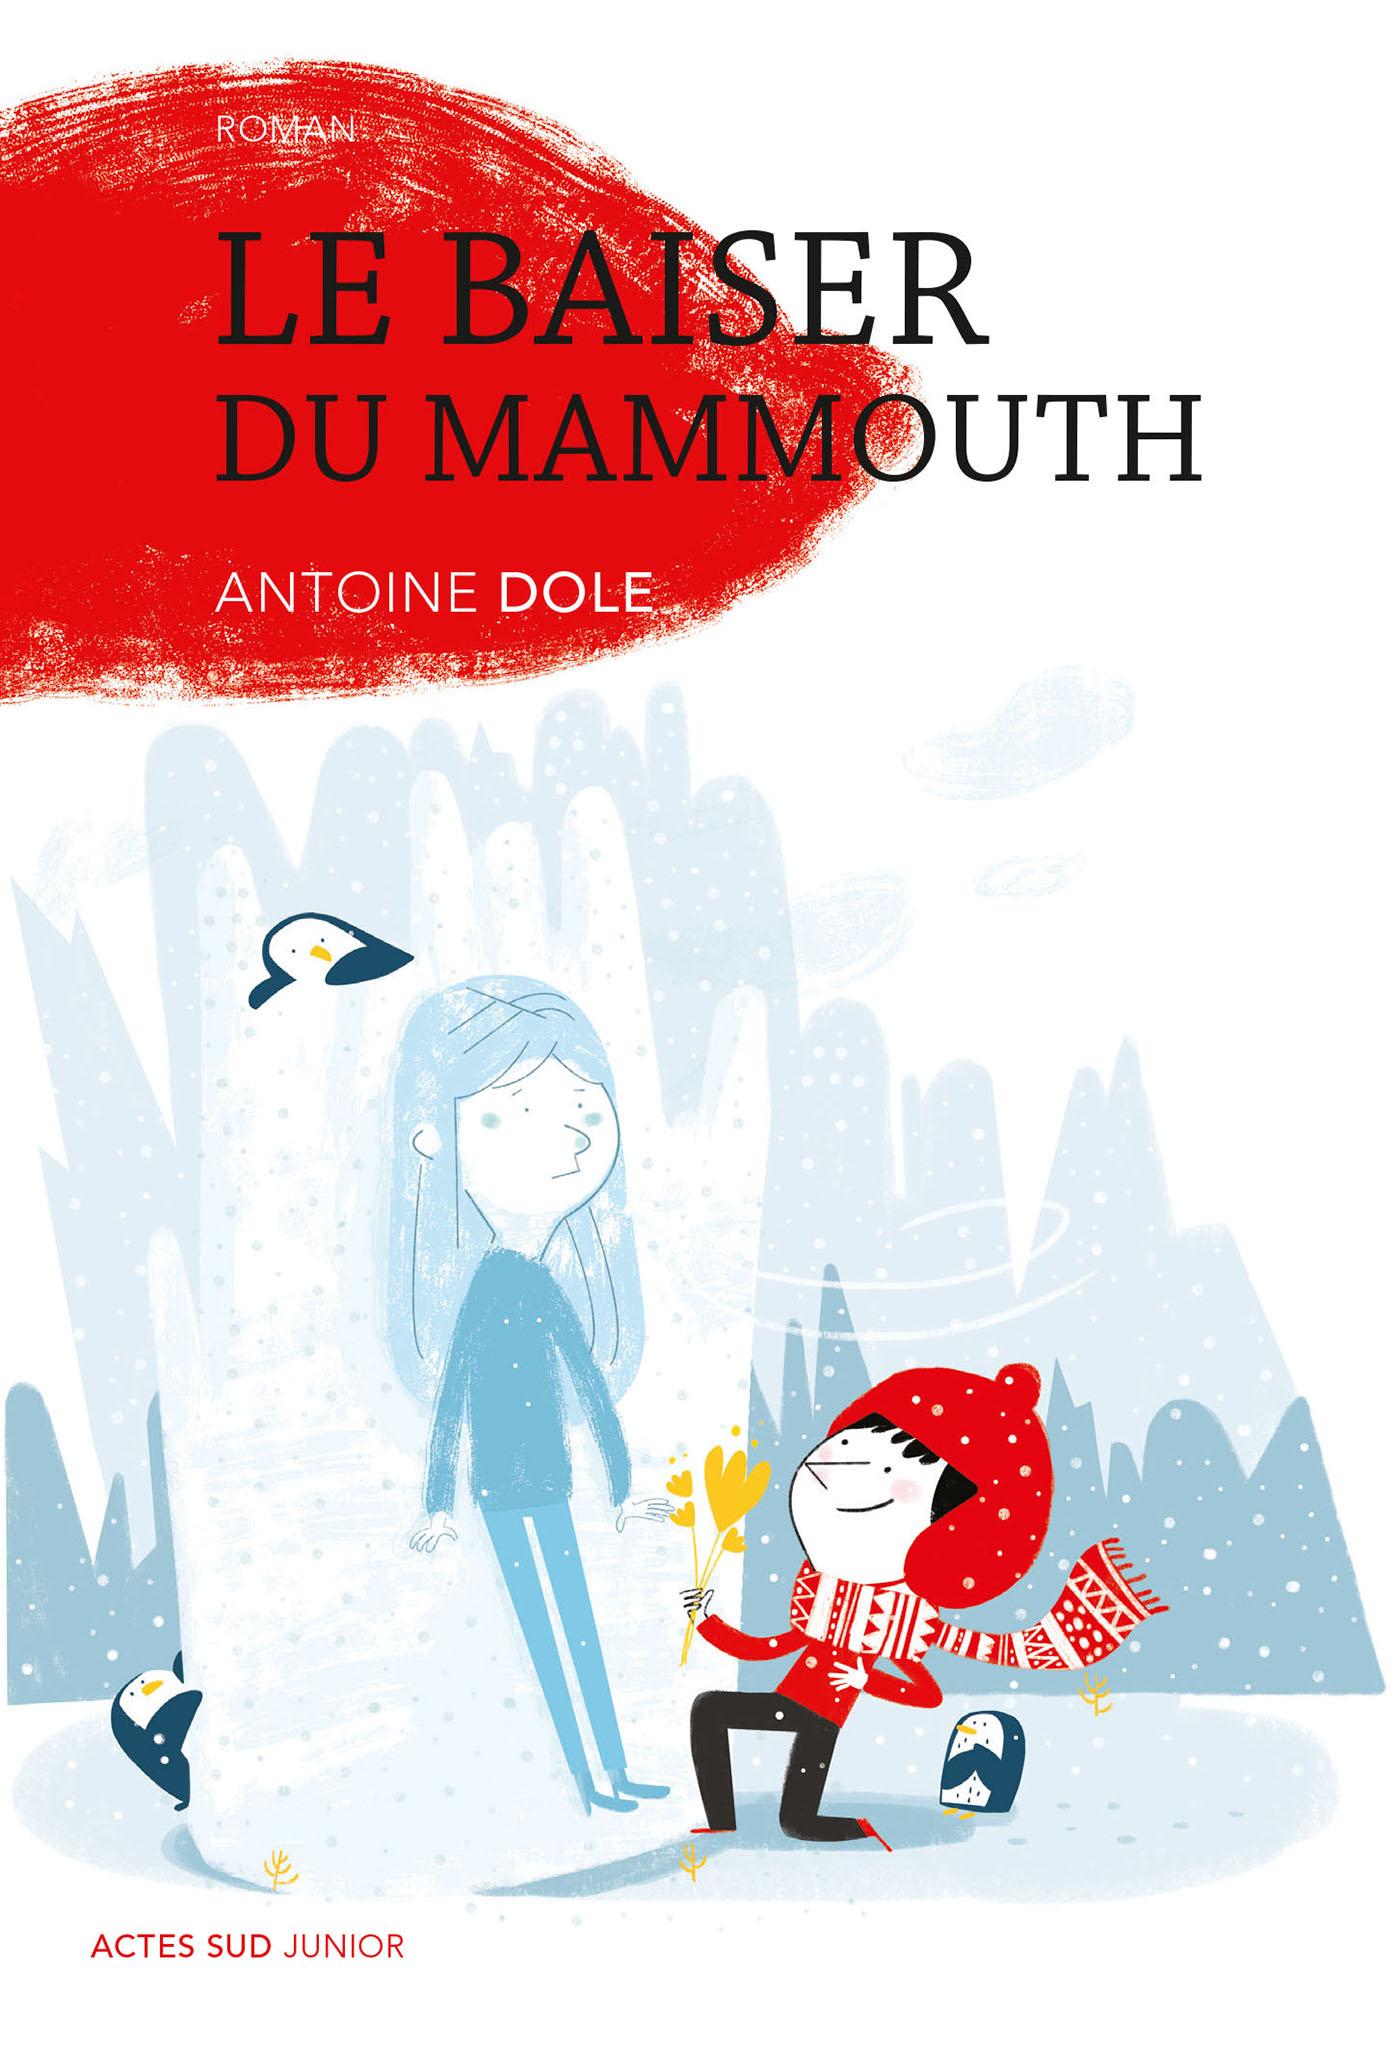 Le baiser du mammouth